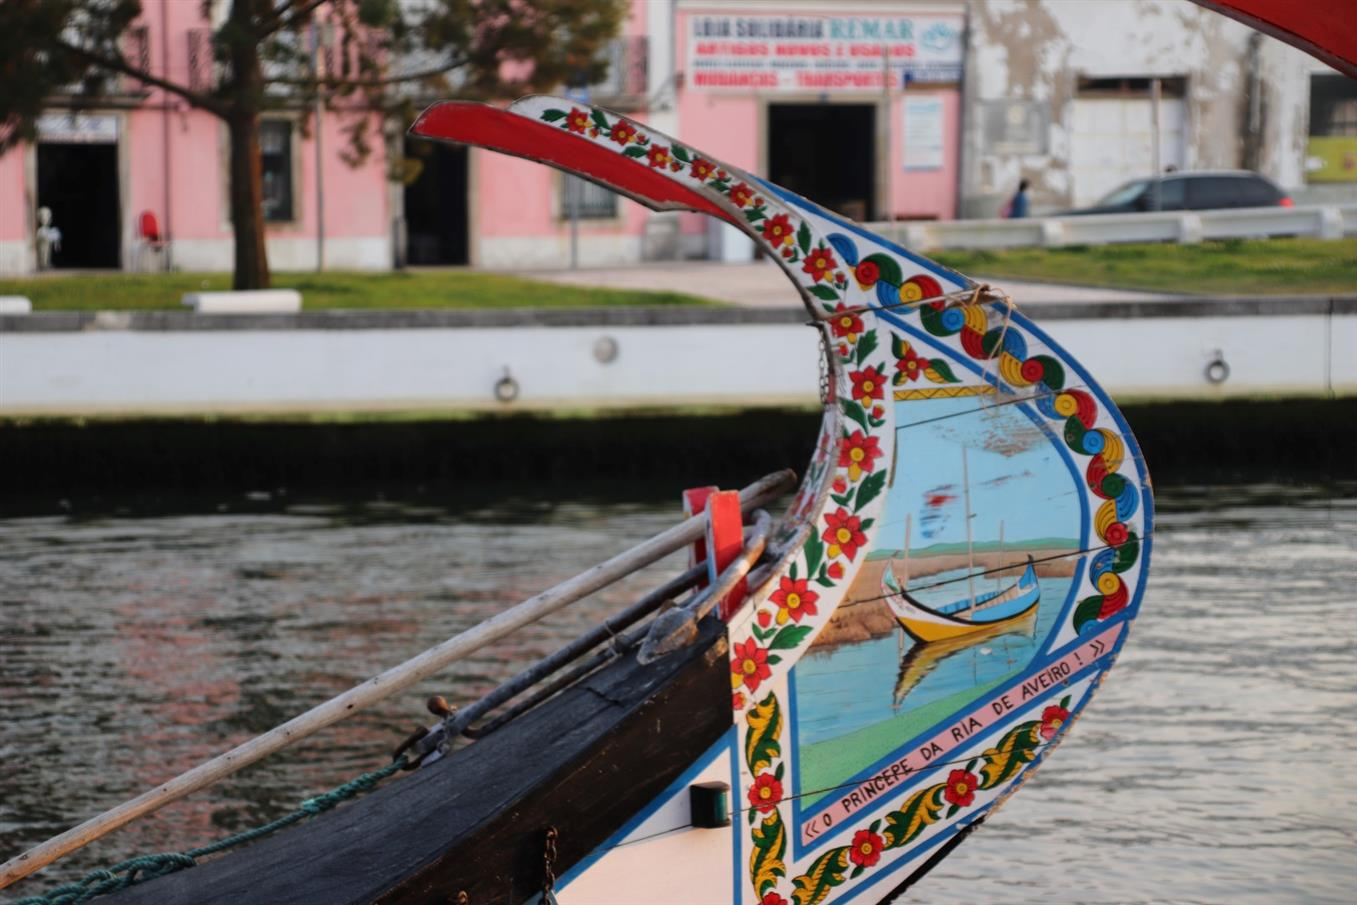 Painted boat in Aveiro, called barco moliceiro - Aveiro day trip